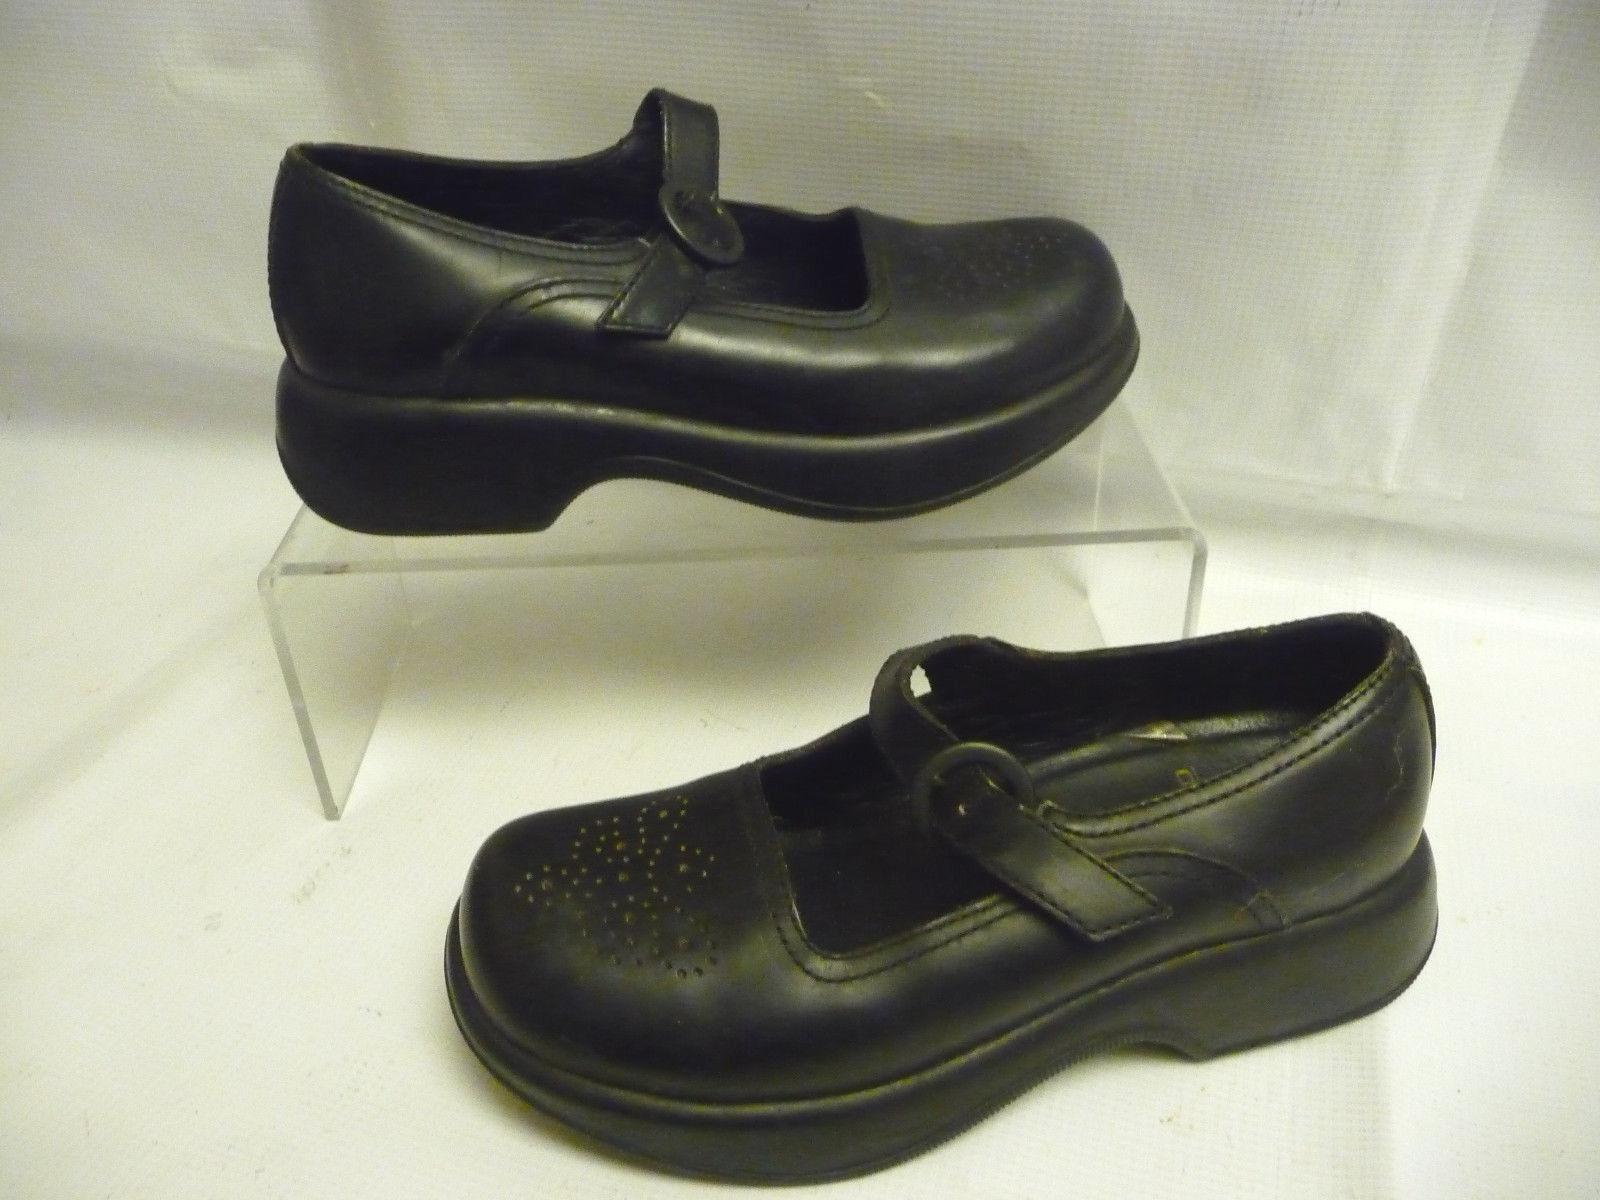 consegna veloce DANSKO Donna  nero scarpe Sz 38 8 8 8 Buckle Strap Leather Mary Jane Portugal  vendita online